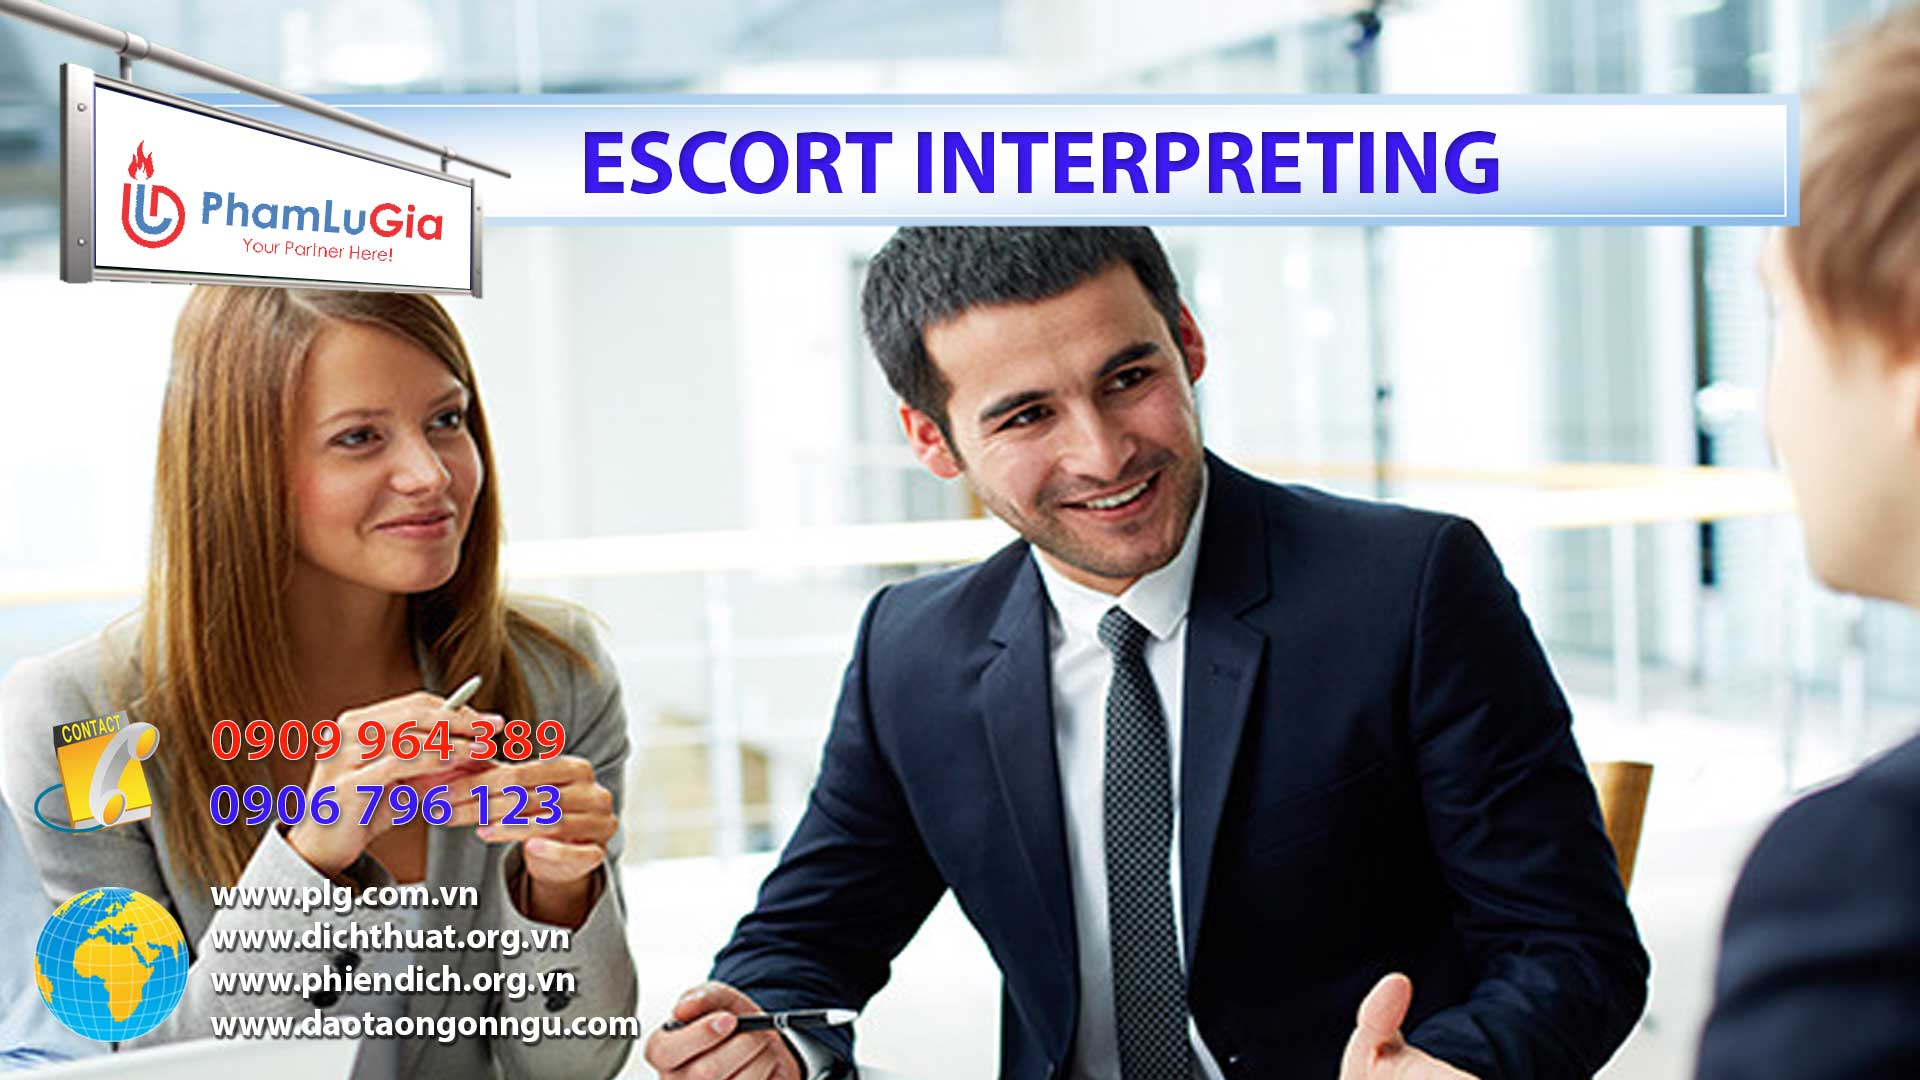 Escort Interpreting